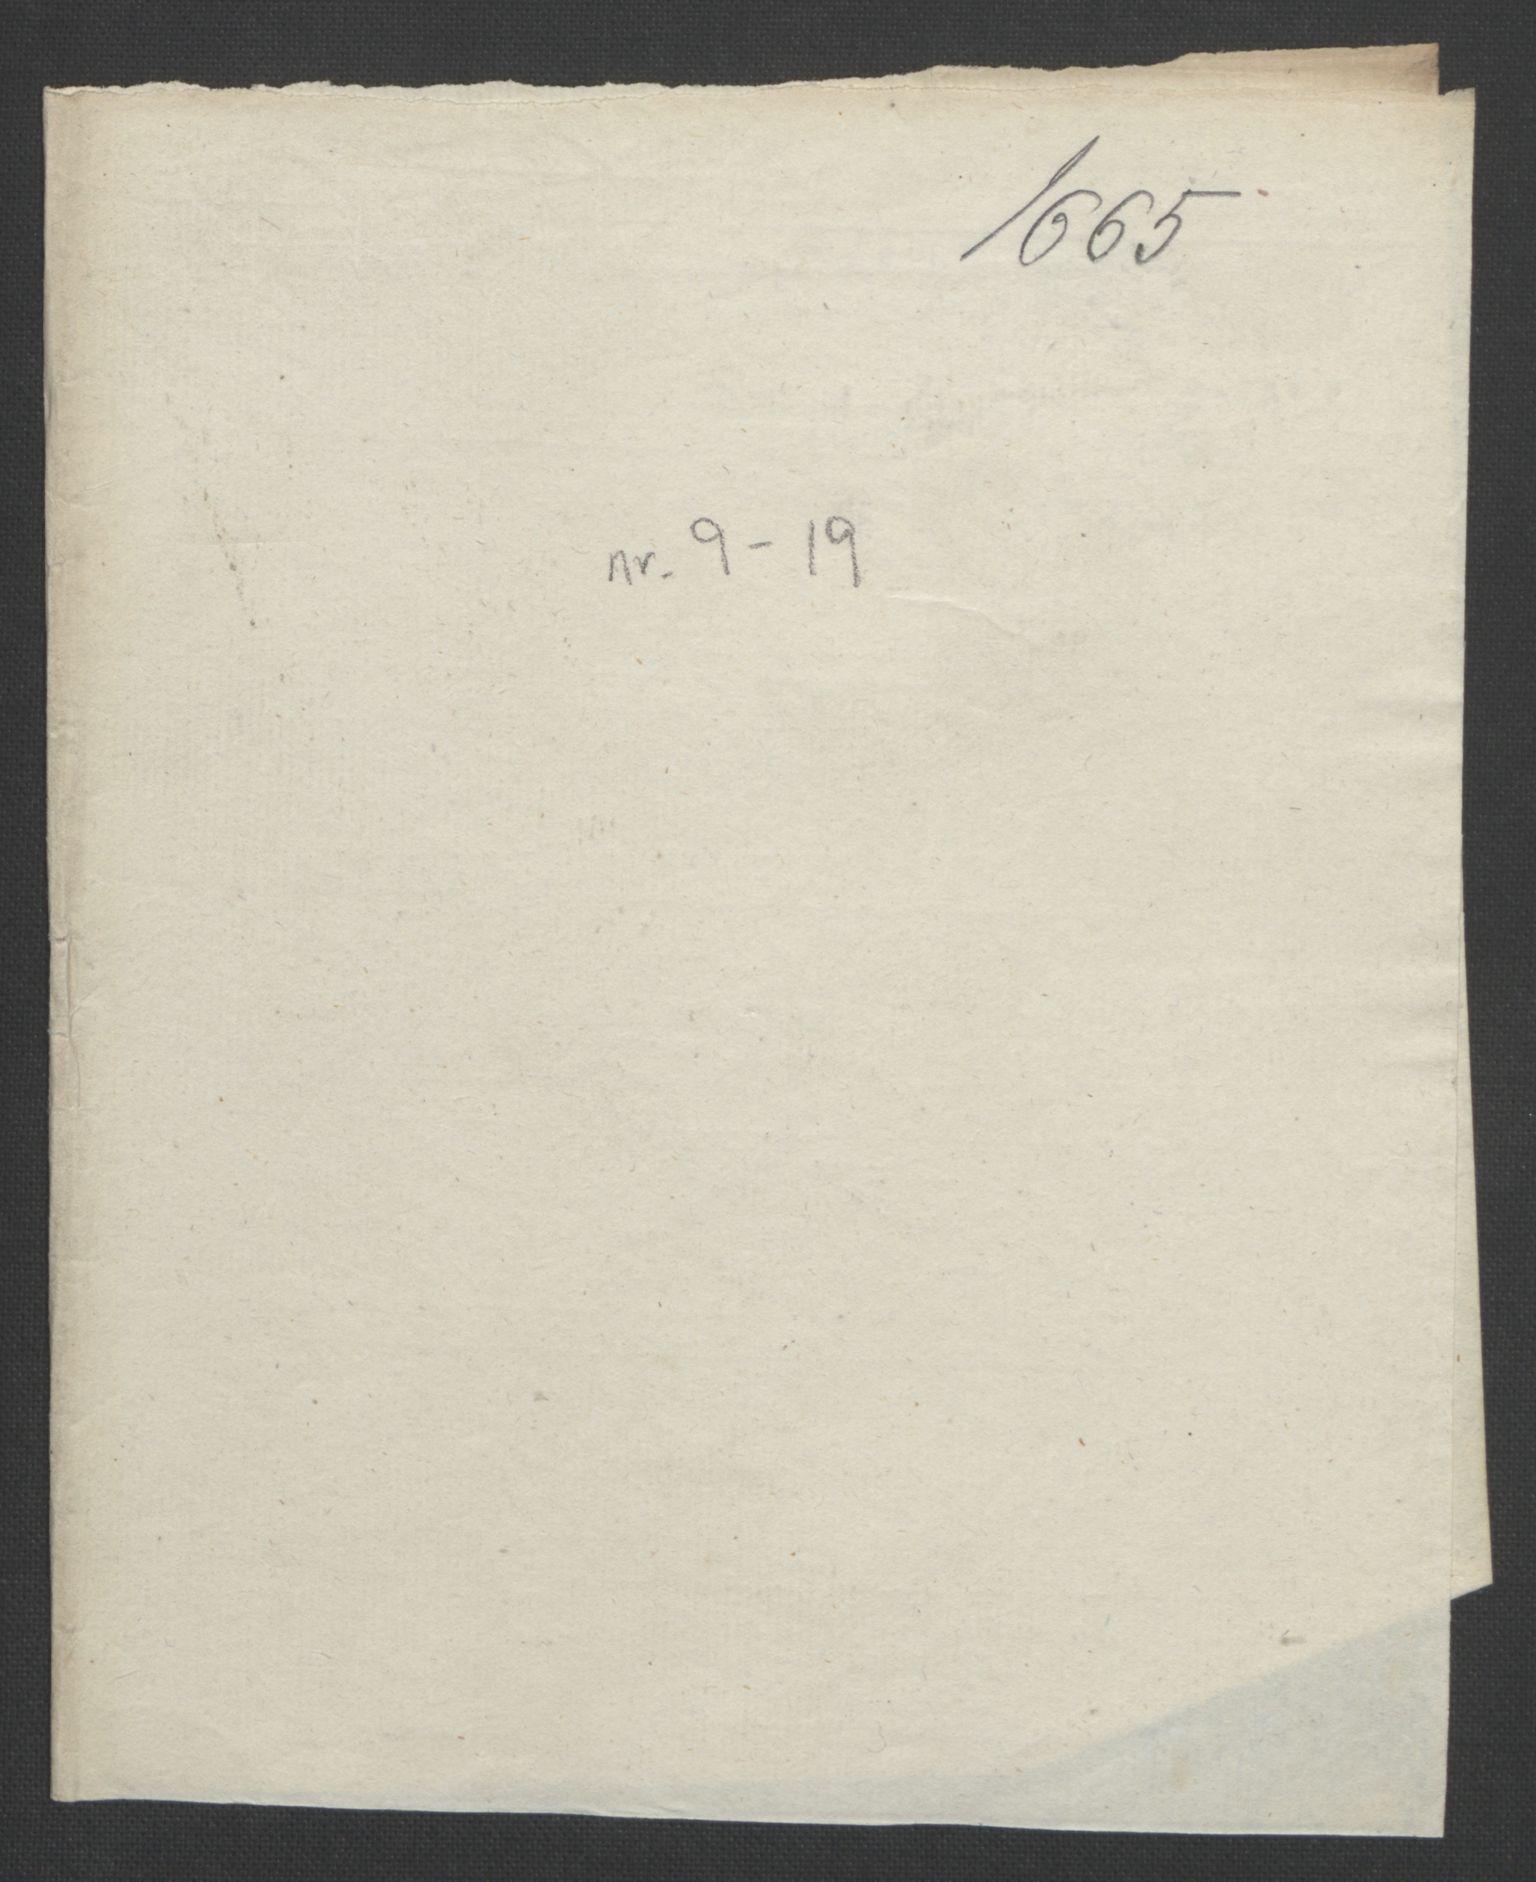 RA, Rentekammeret inntil 1814, Reviderte regnskaper, Fogderegnskap, R32/L1842: Fogderegnskap Jarlsberg grevskap, 1664-1673, s. 19